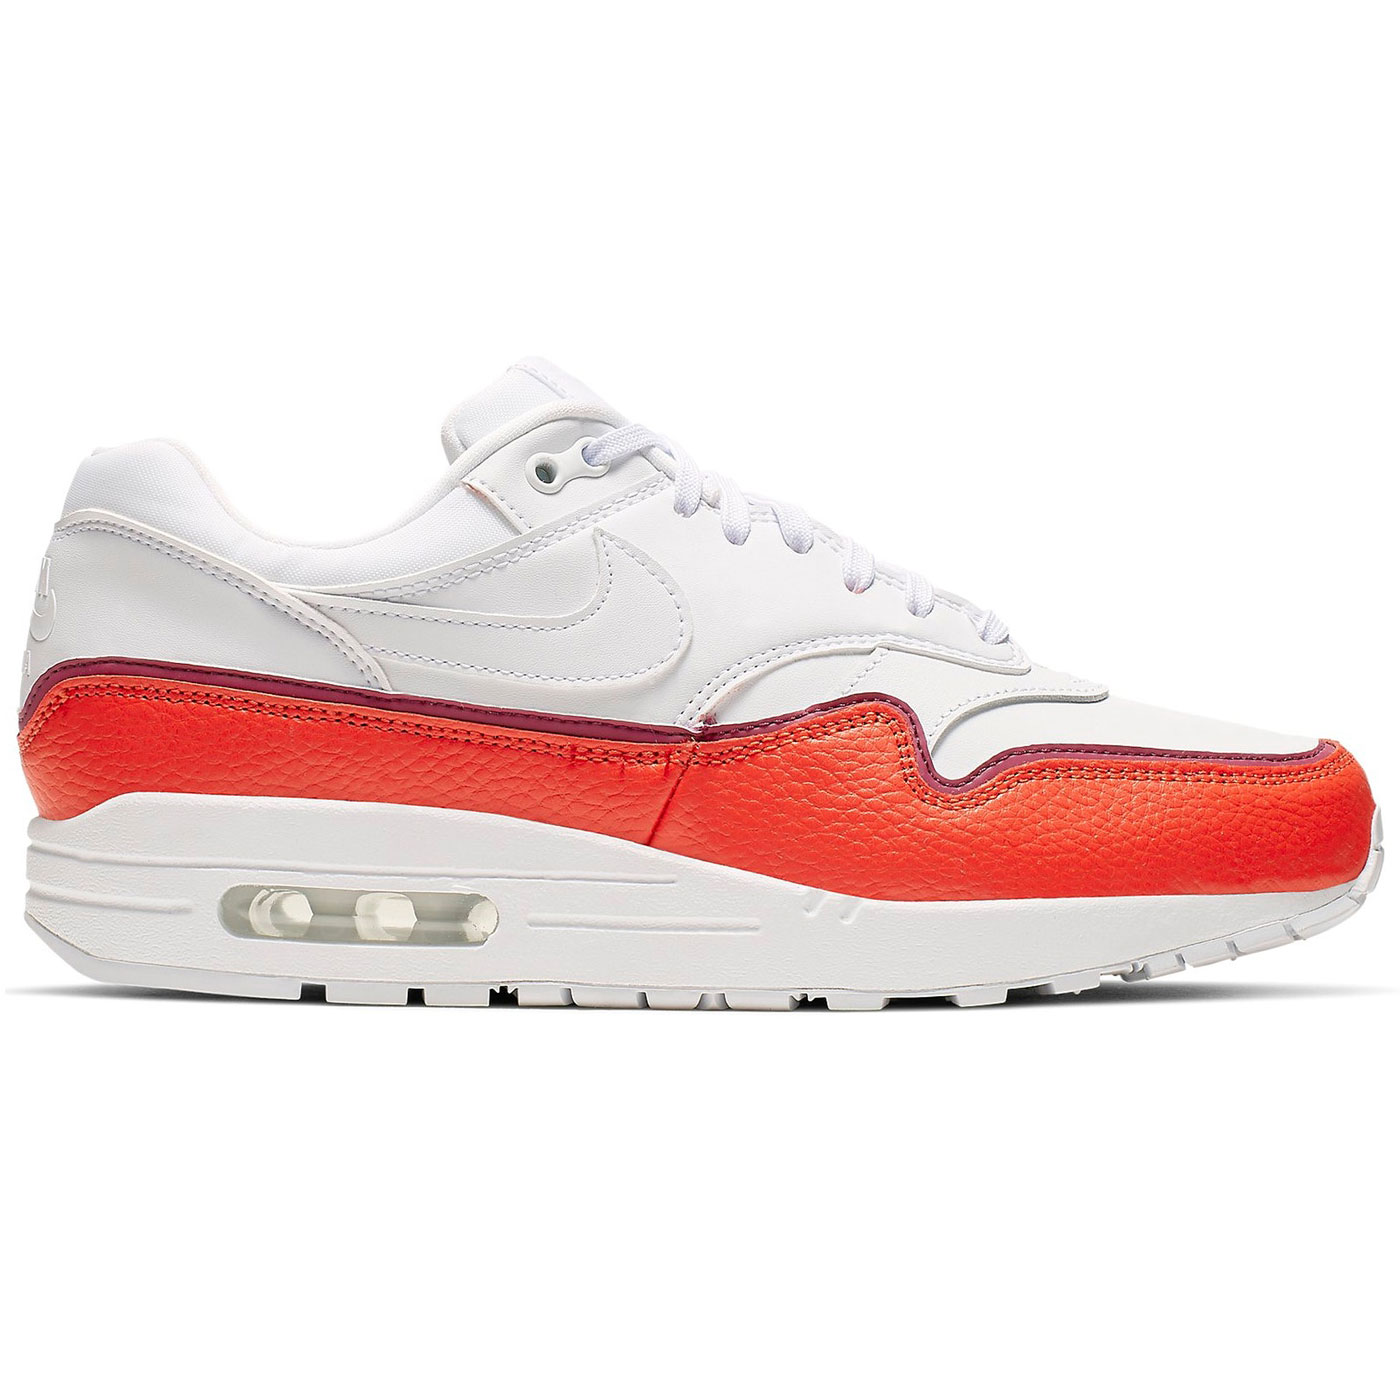 Nike WMNS Air Max 1 SE 881101 102 weiß orange